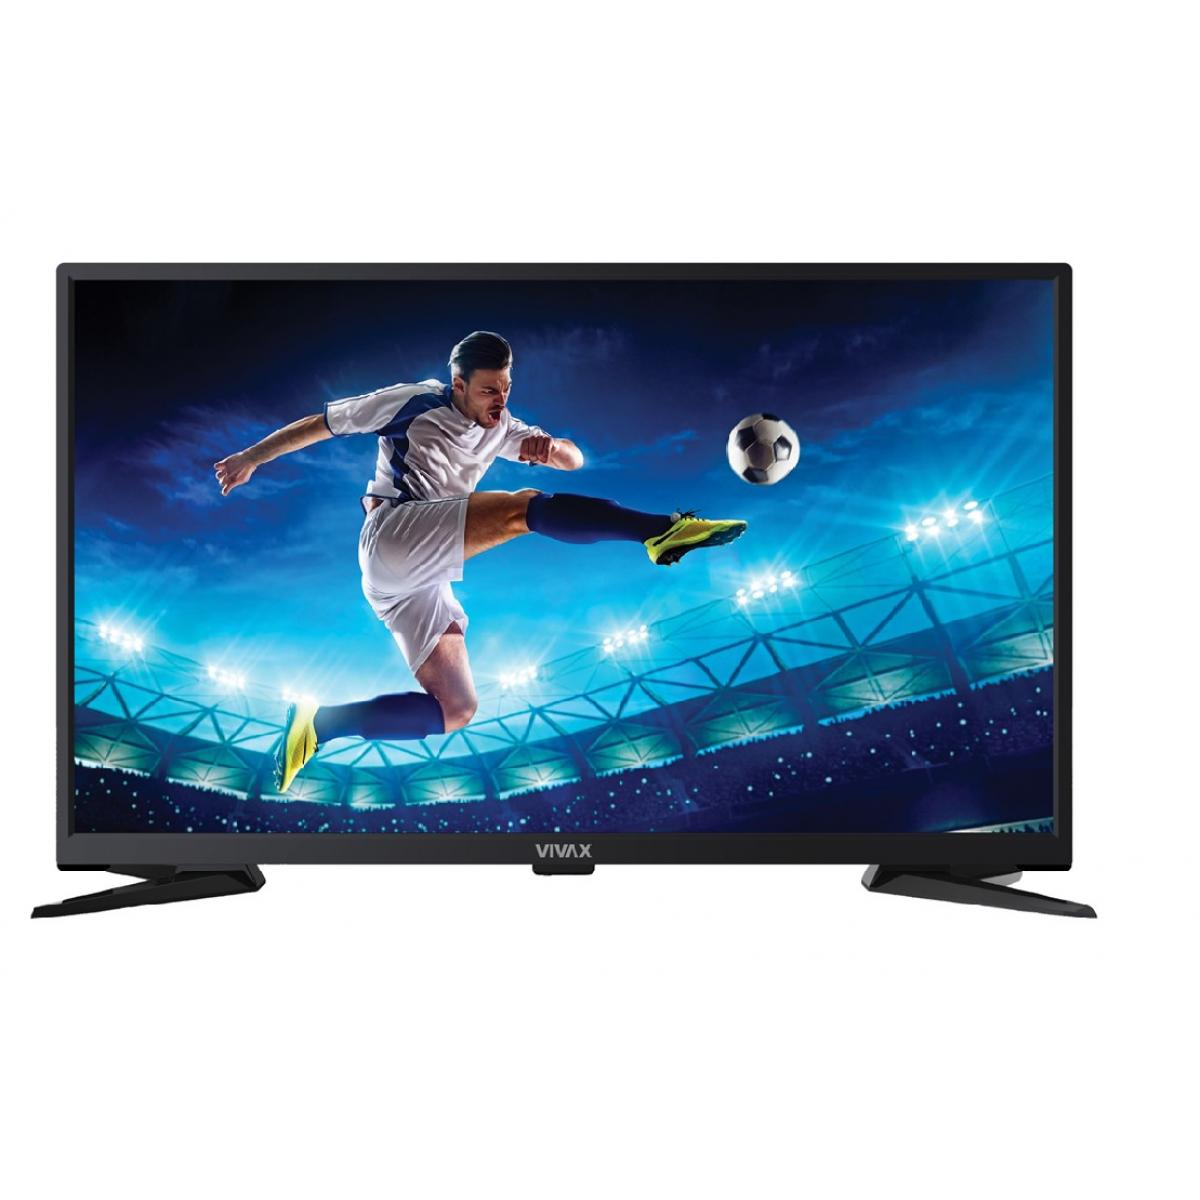 VIVAX 32S60T2G Televizor